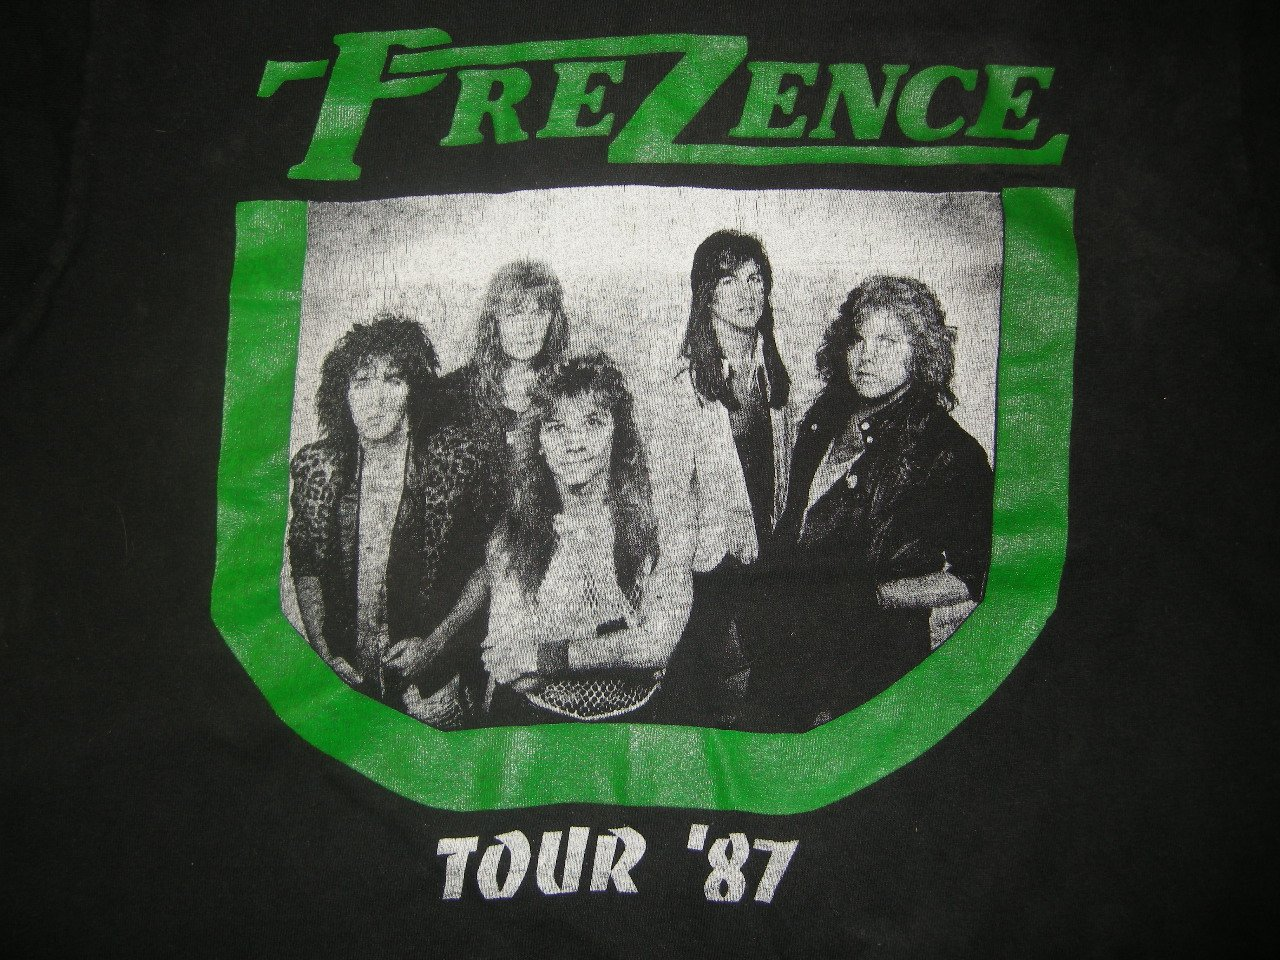 PREZENCE SHIRT 1987 Tour shawn sahm texas metal XL VINTAGE MEGA RARE